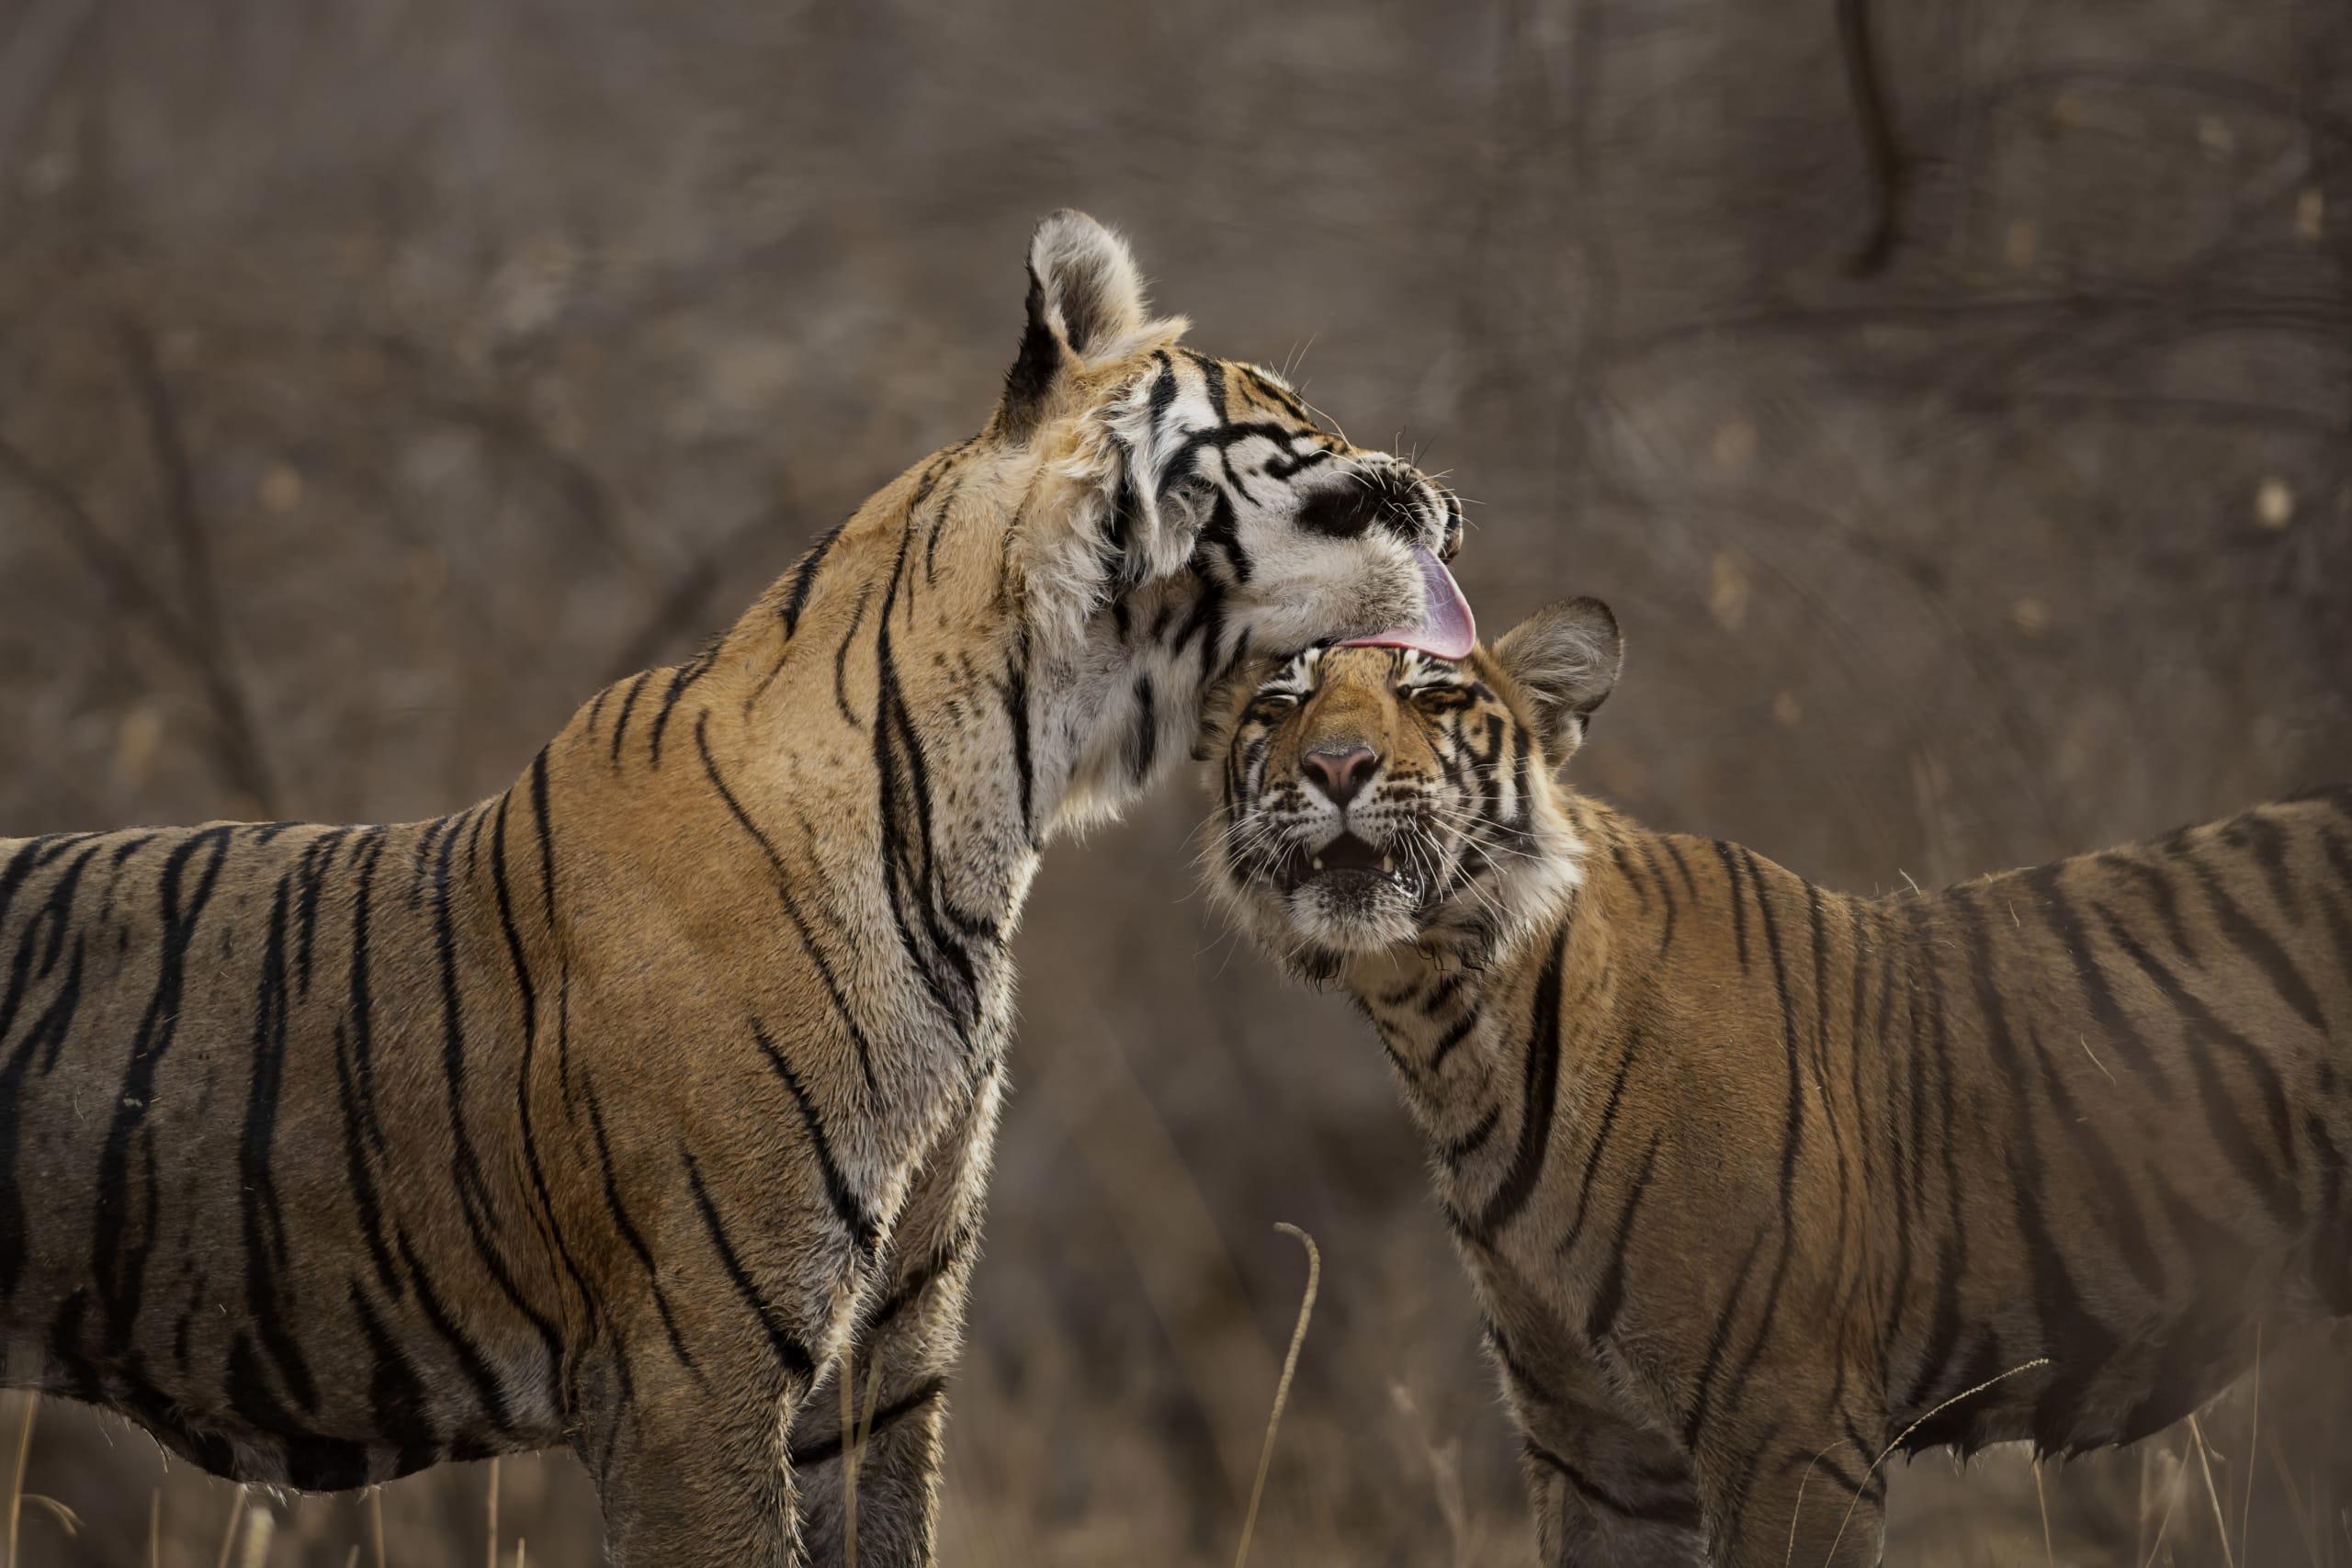 Krishna and her sub-adult cub at Ranthambore National Park. Photo: Pallavi Laveti, May 2018